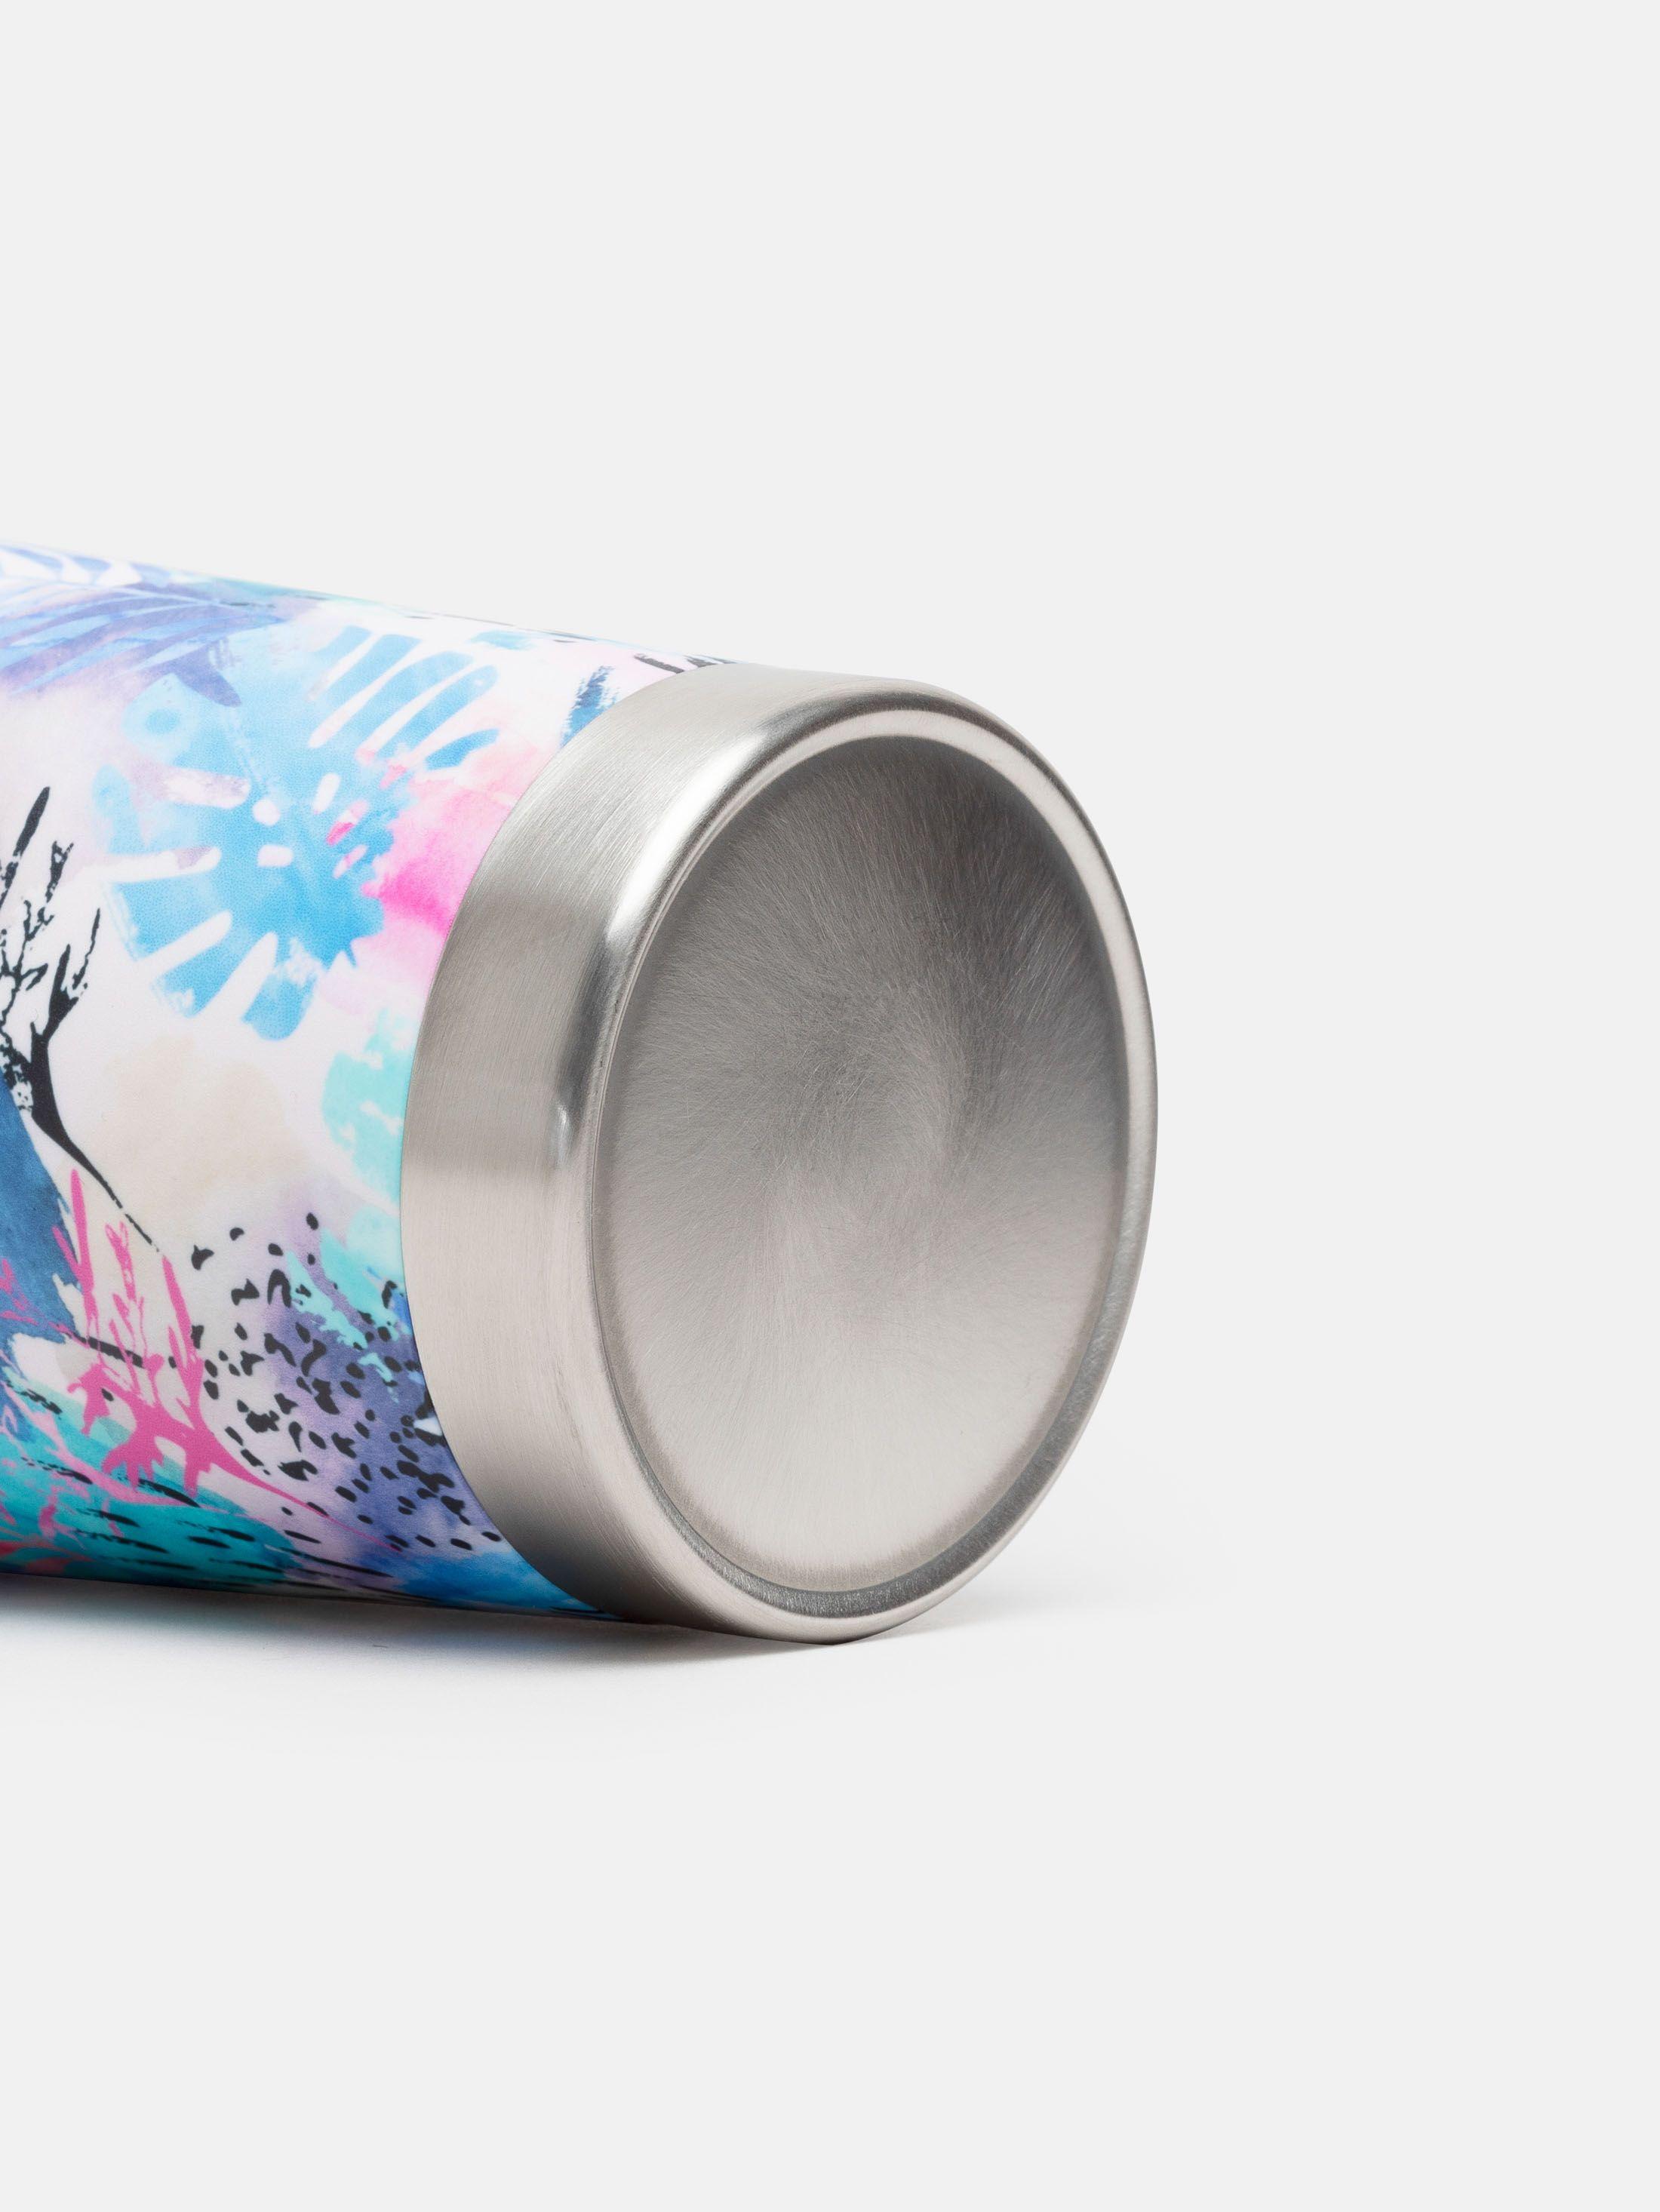 Travel Coffee Mugs Printed To Order